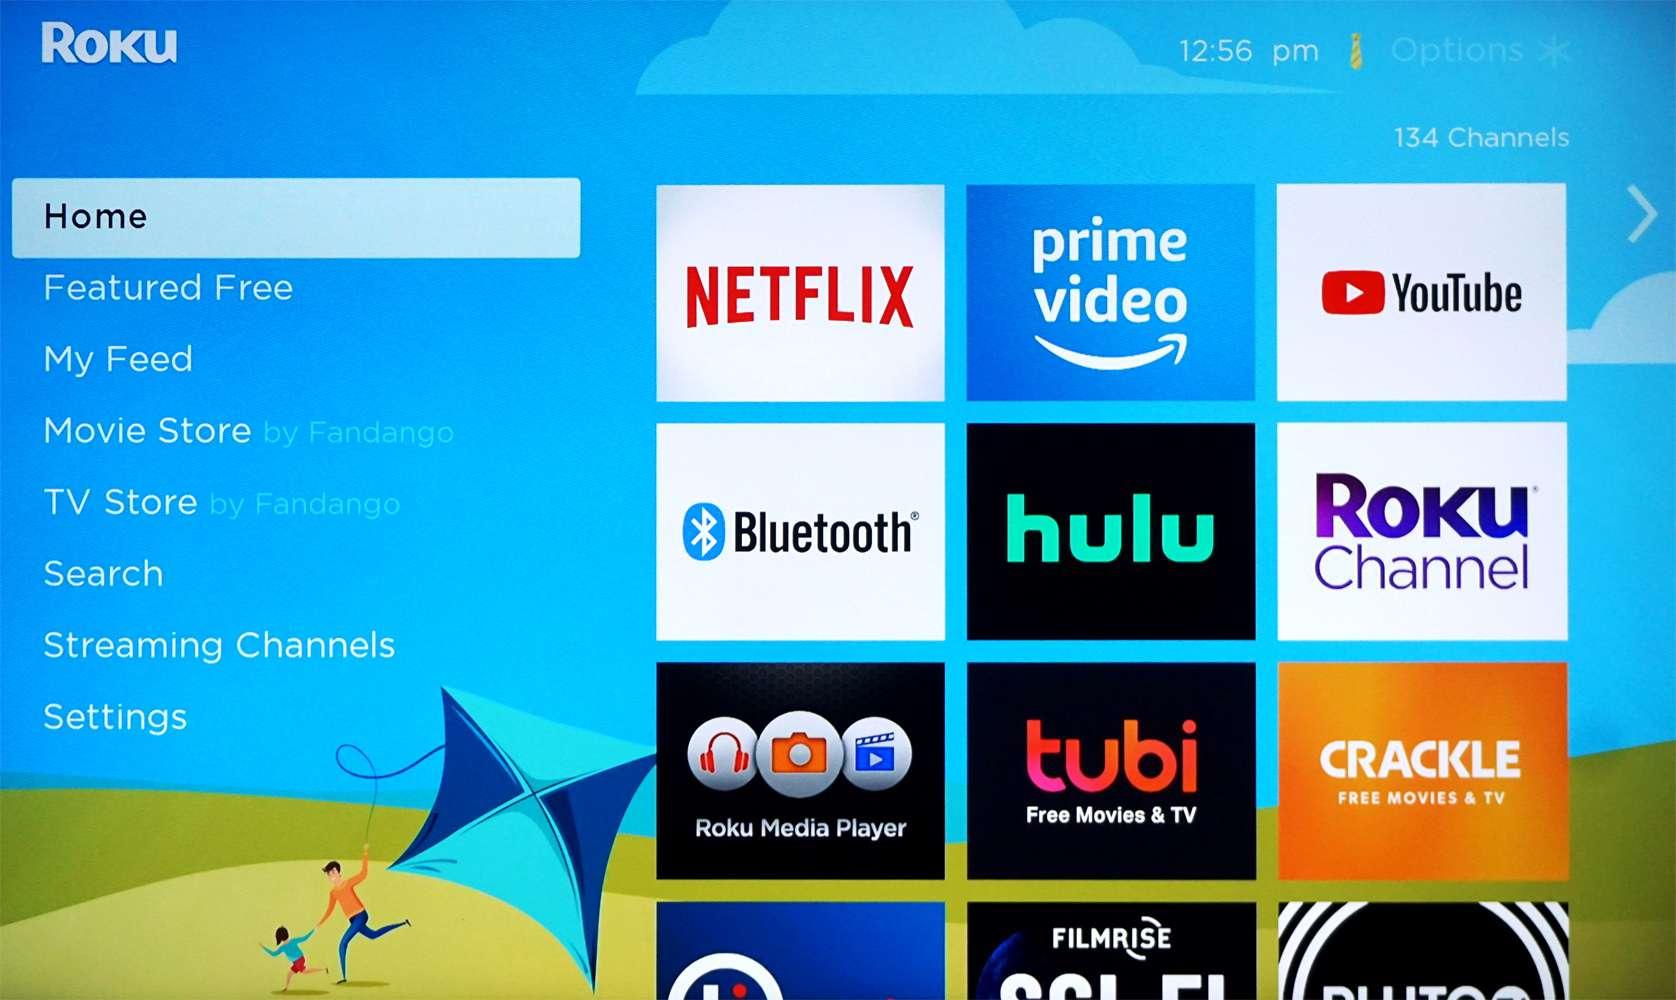 Roku home page on a TV with the sky-blue Kite theme